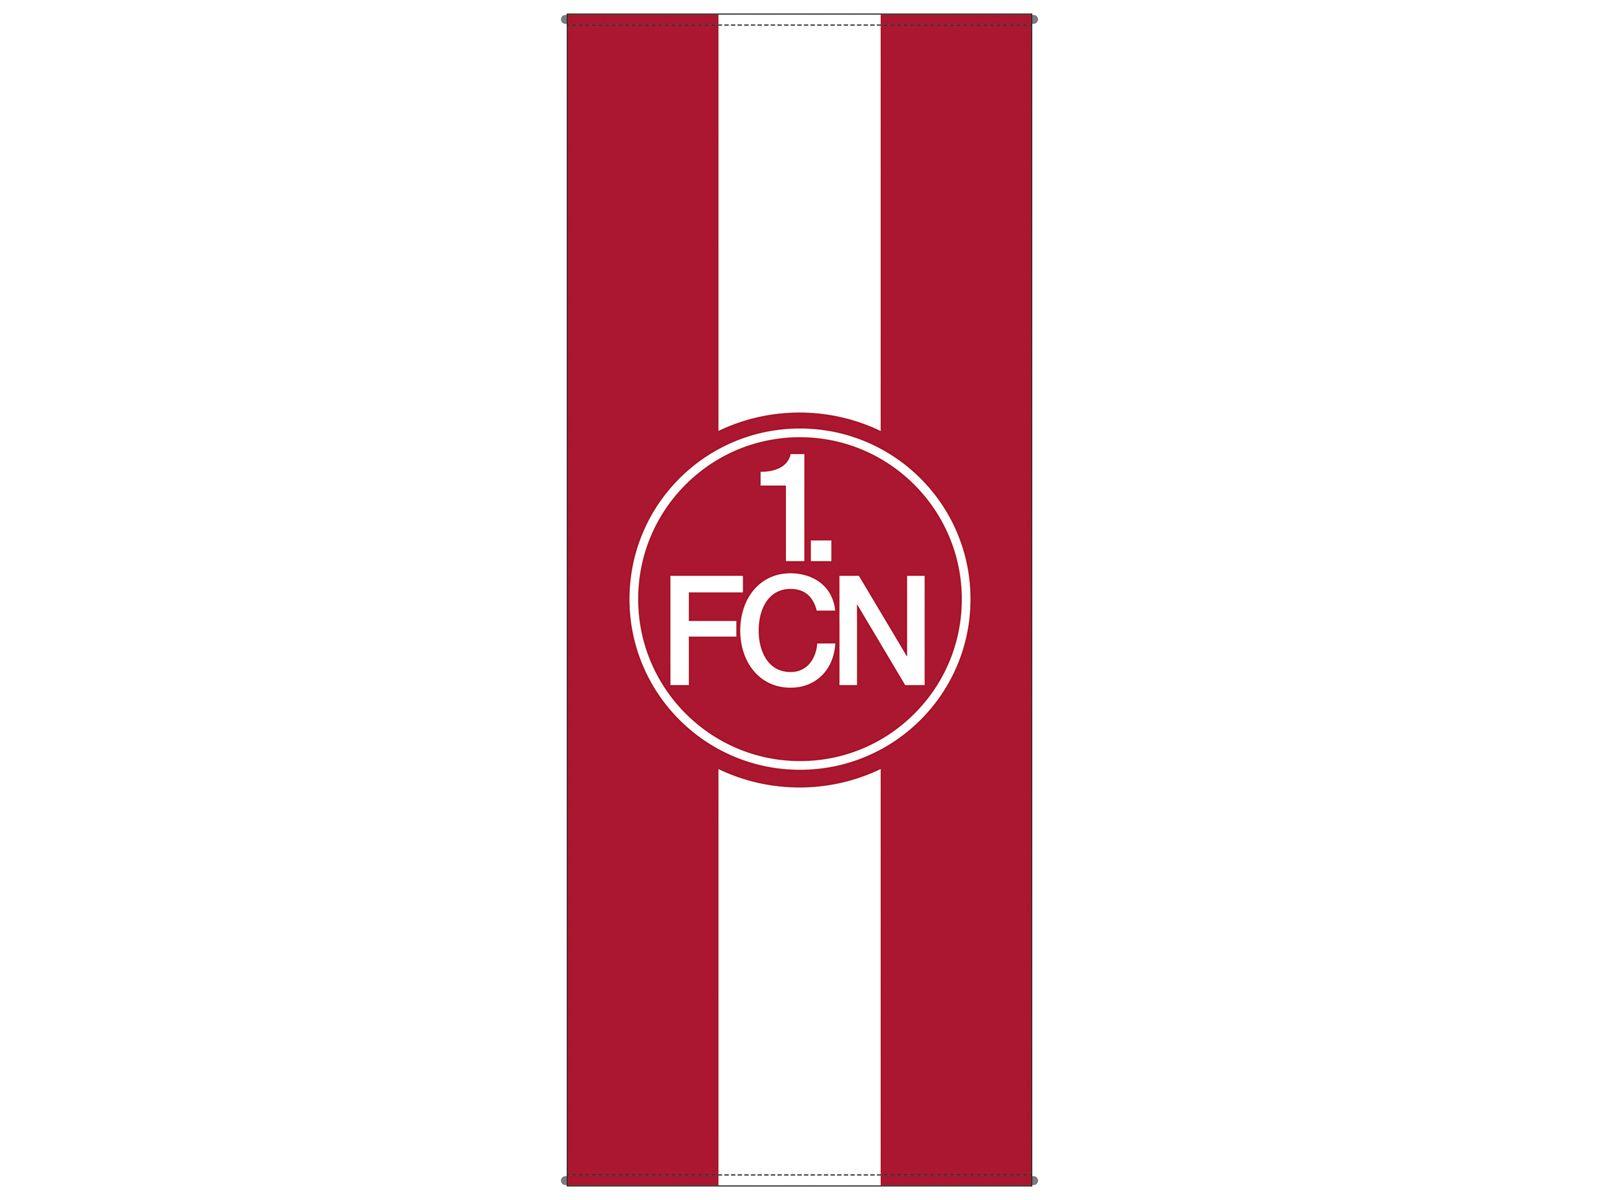 1 FCN | BANNERFAHNE FAHNE FLAGGE 1. FCN - 1. FC Nürnberg NEU | Fussball in Bayern | Logos ...